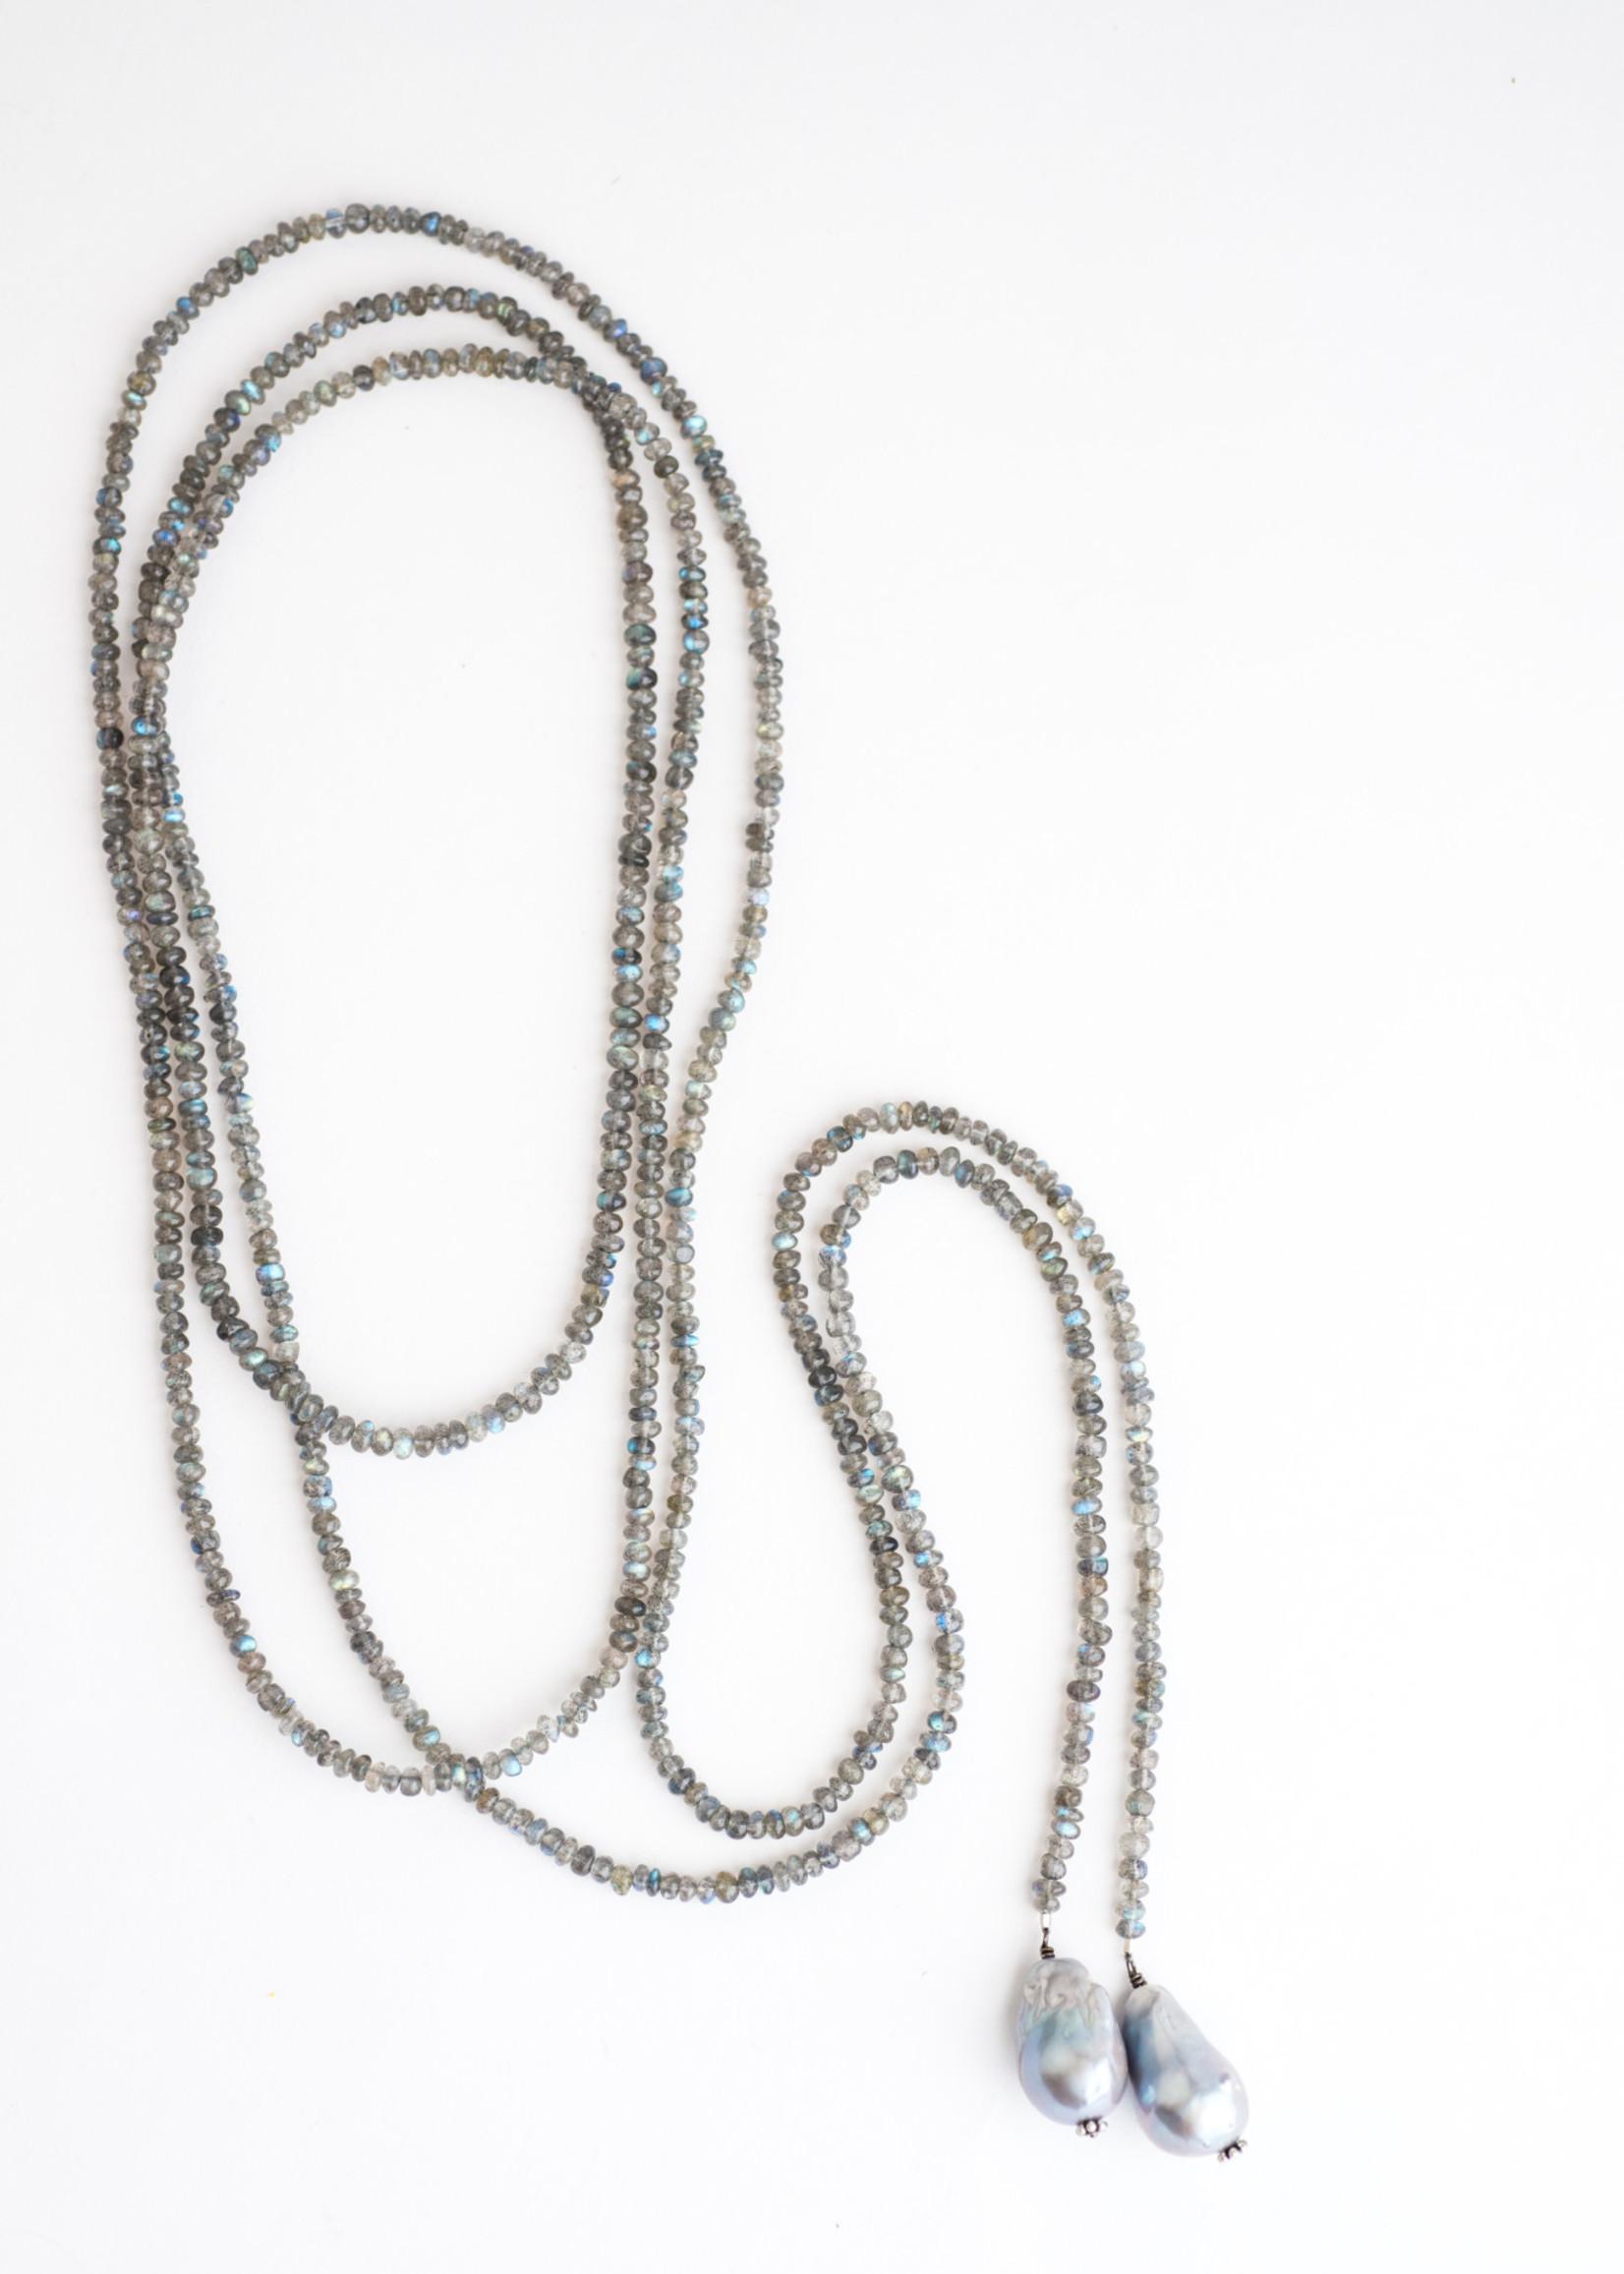 Mina Danielle Labradorite Lariat Chain with hanging Baroque Pearls